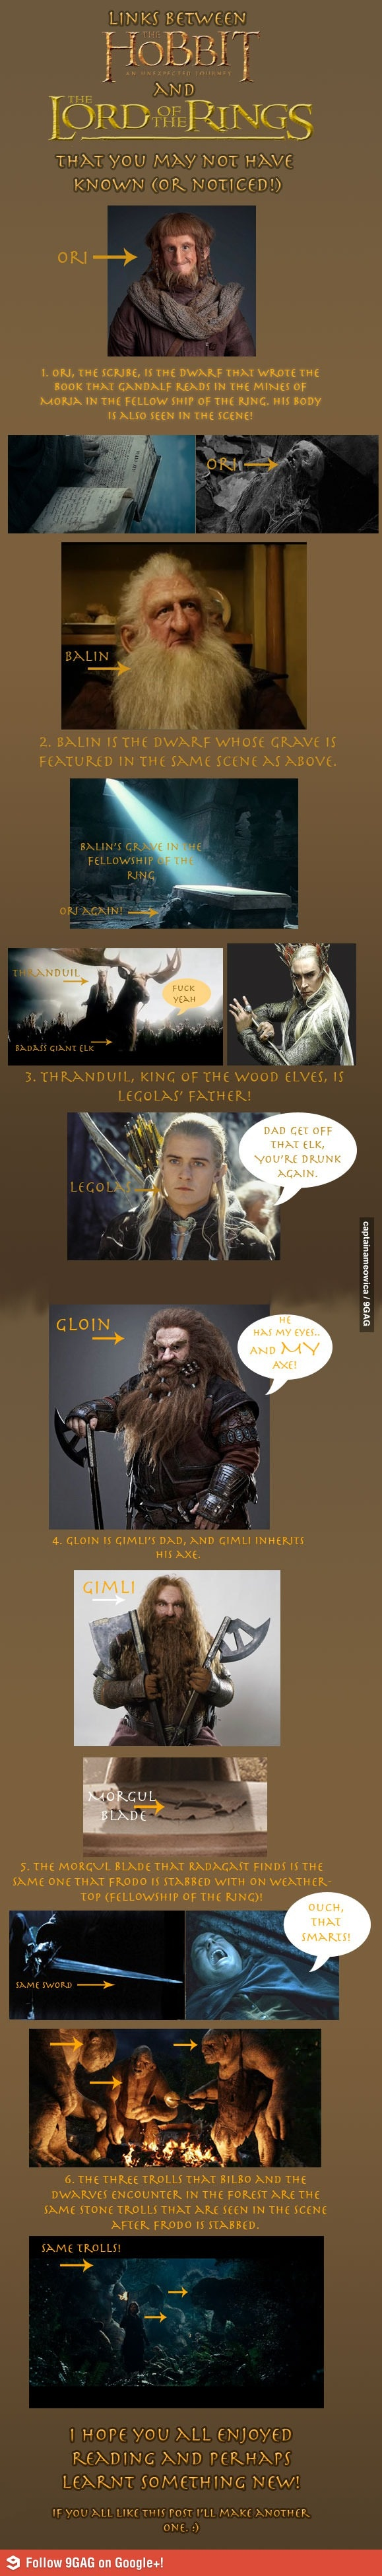 The Hobbit/LOTRS